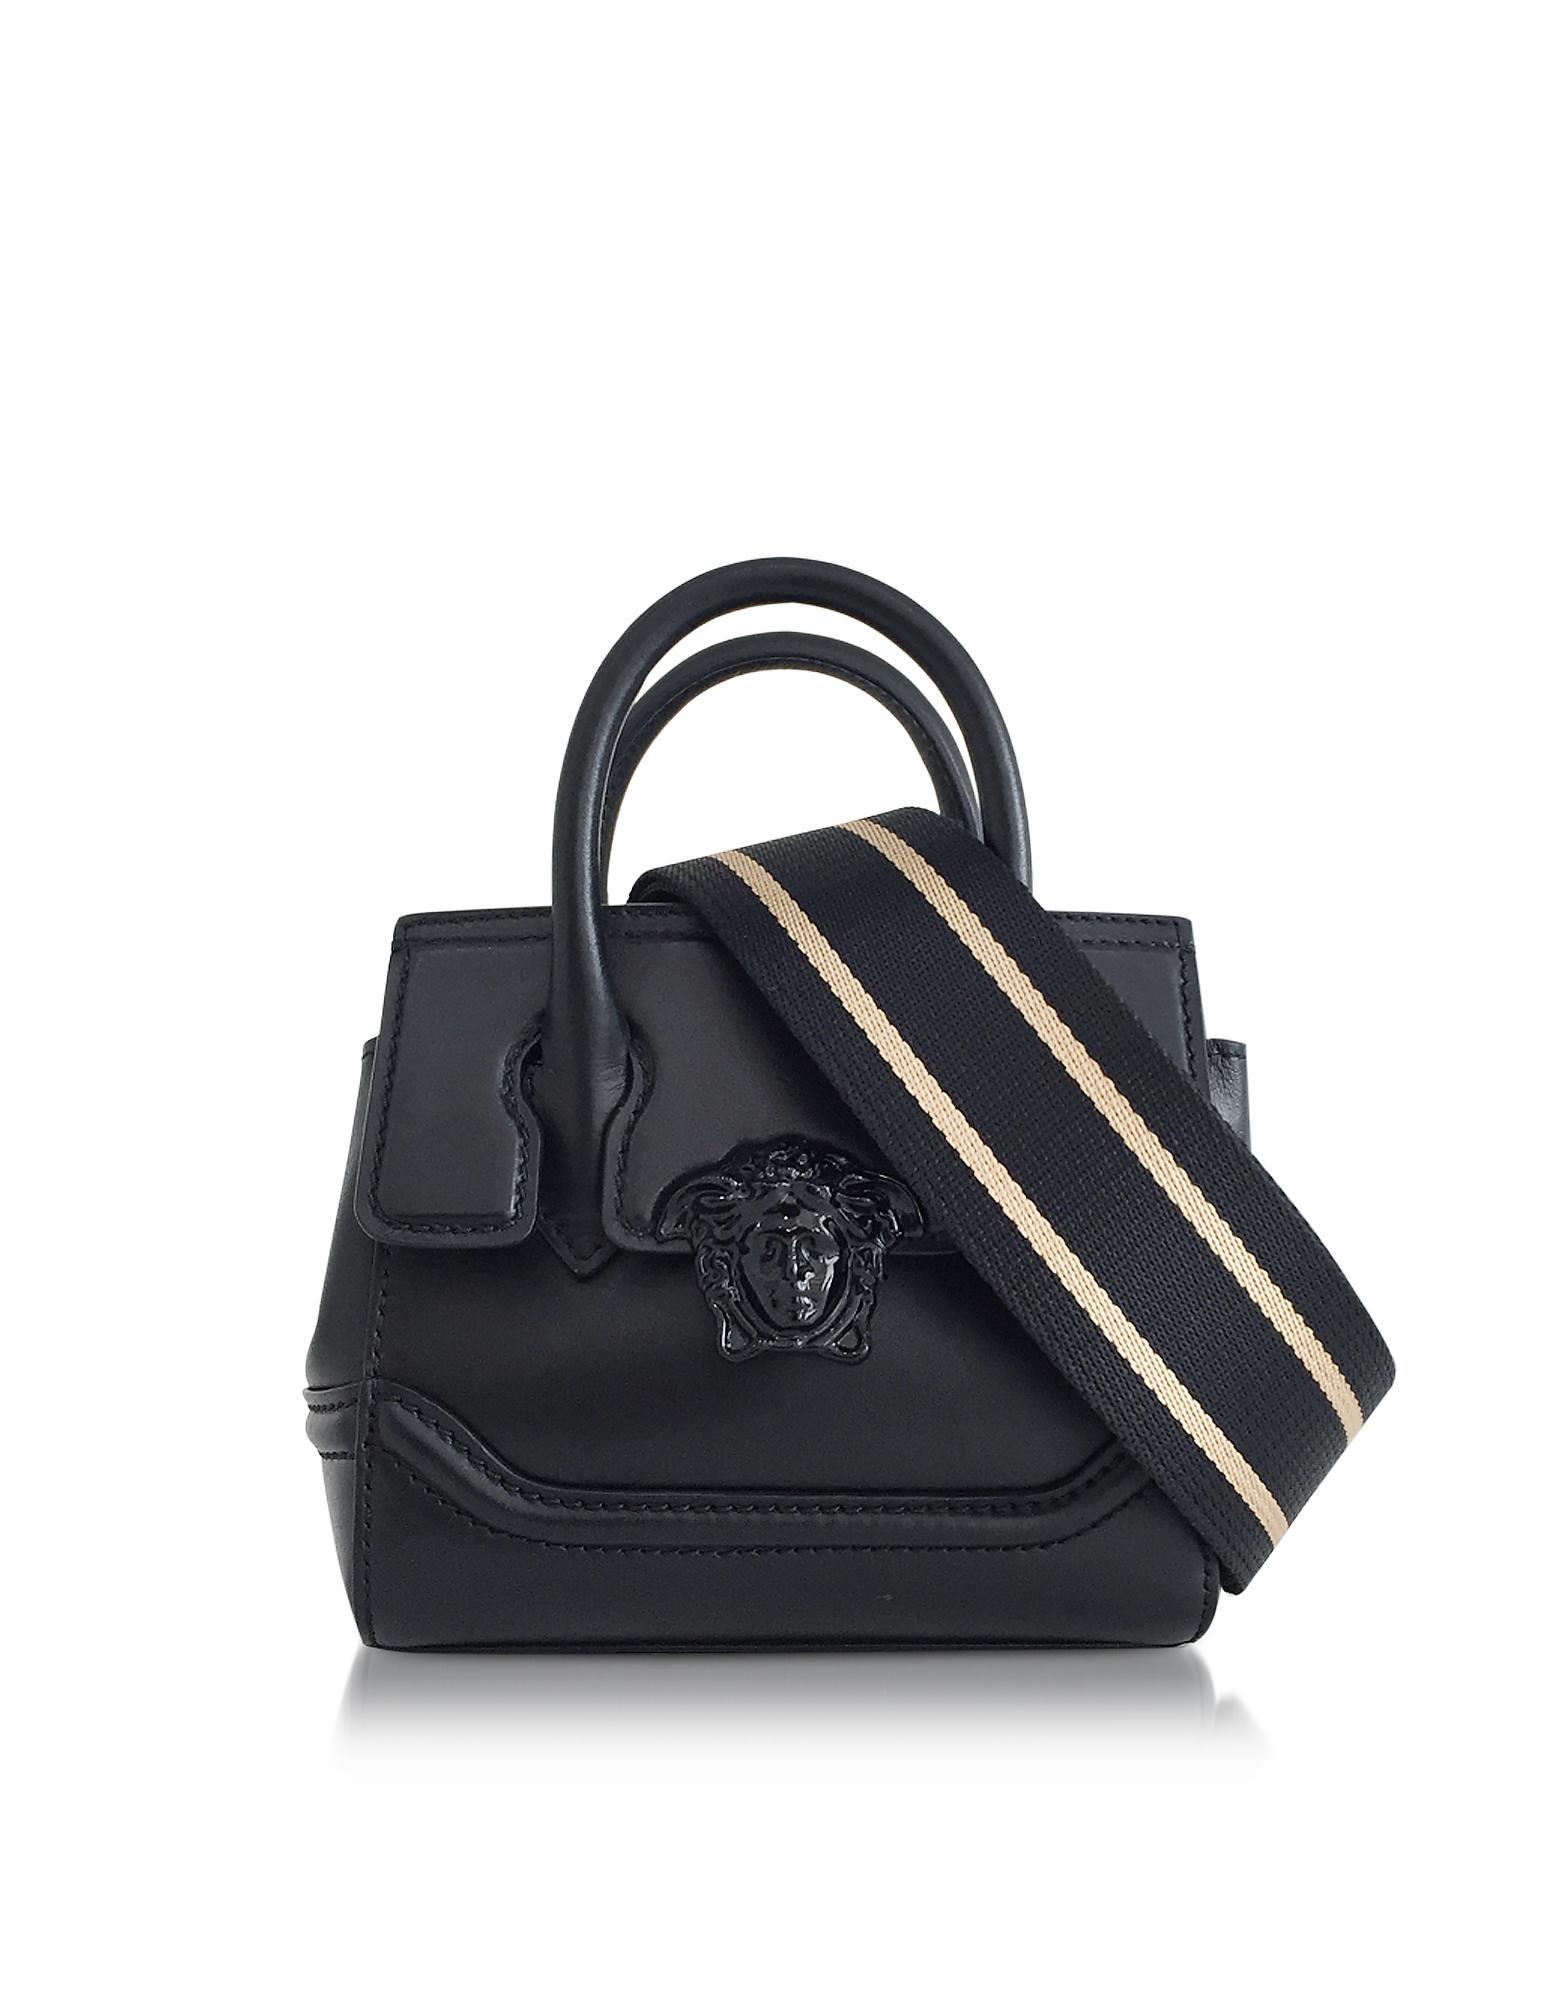 649d1373d4 Lyst - Versace Palazzo Empire Black Leather Mini Handbag in Black